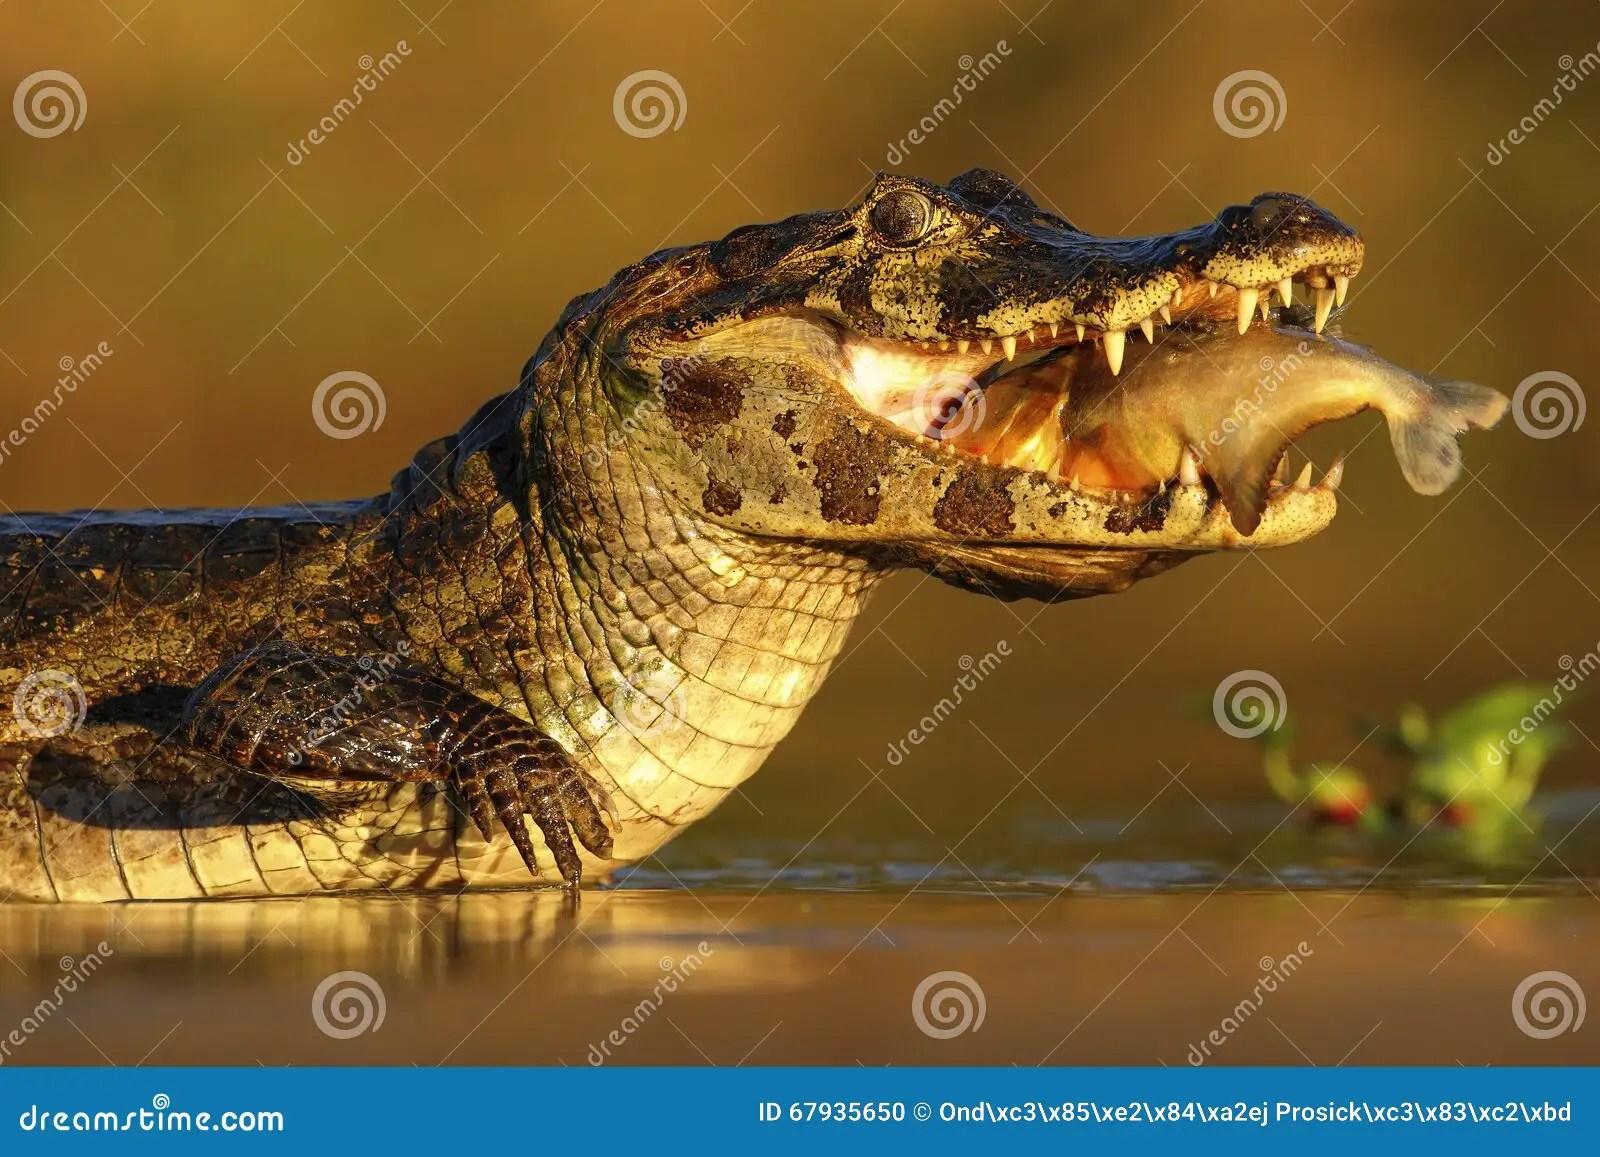 Yacare Caiman Crocodile With Fish In With Evening Sun